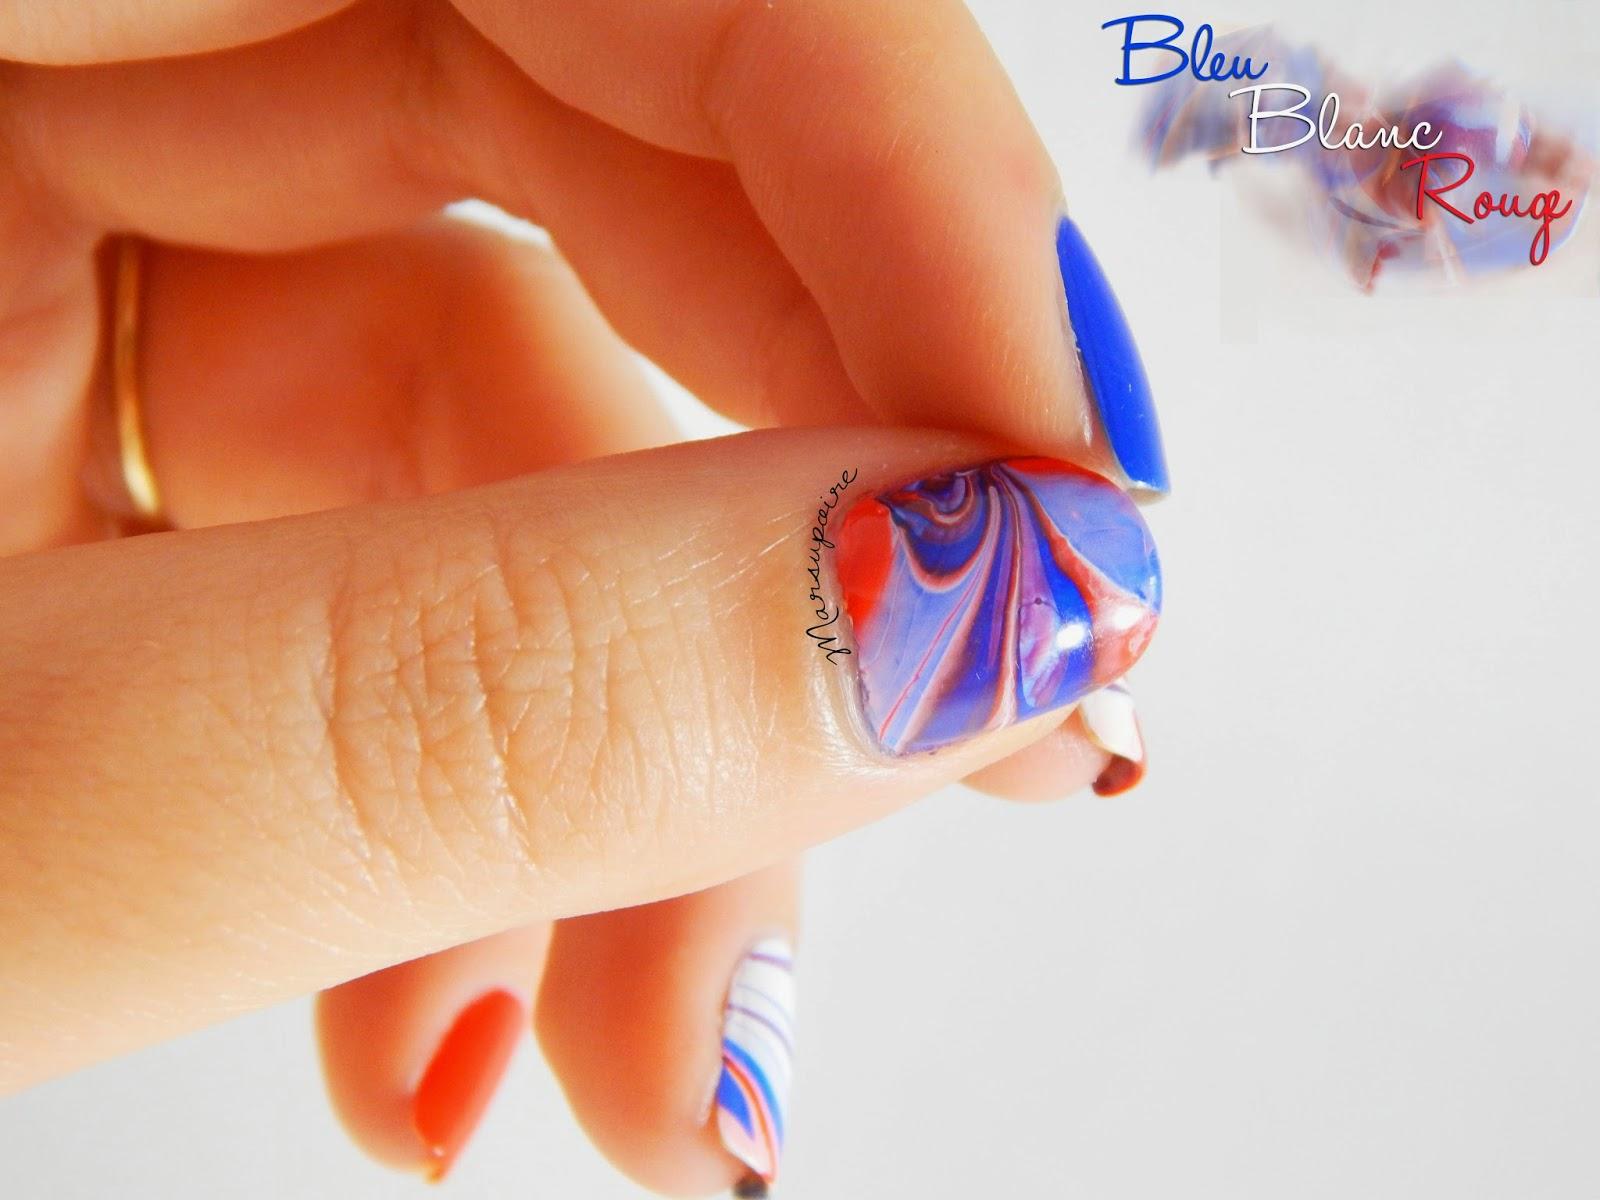 Nail art Watermarble bleu blanc rouge_pouce